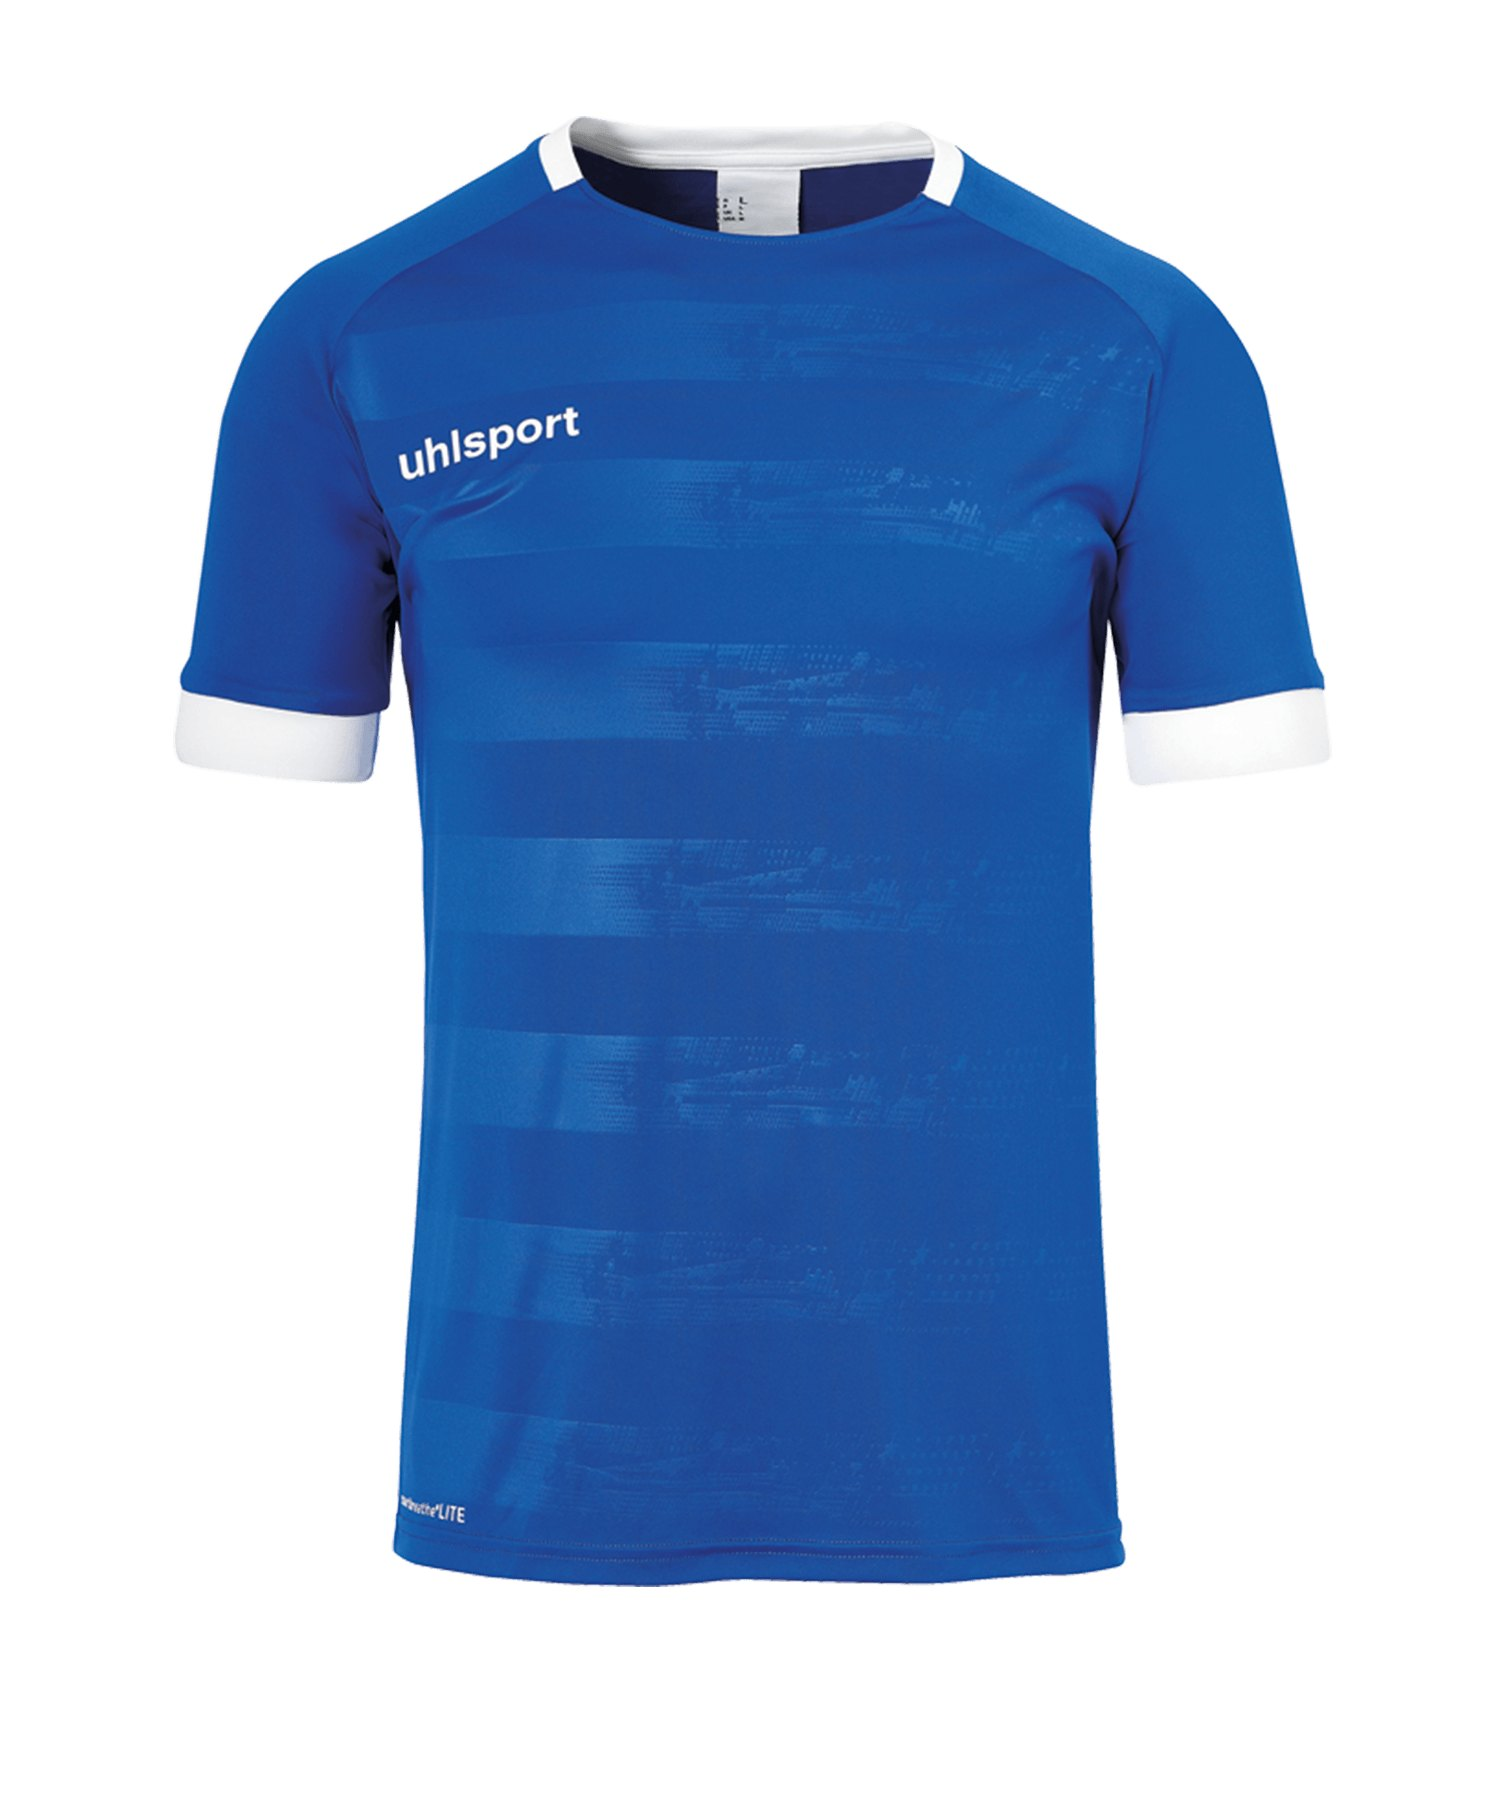 Uhlsport Division II Trikot kurzarm Kids Blau F03 - blau